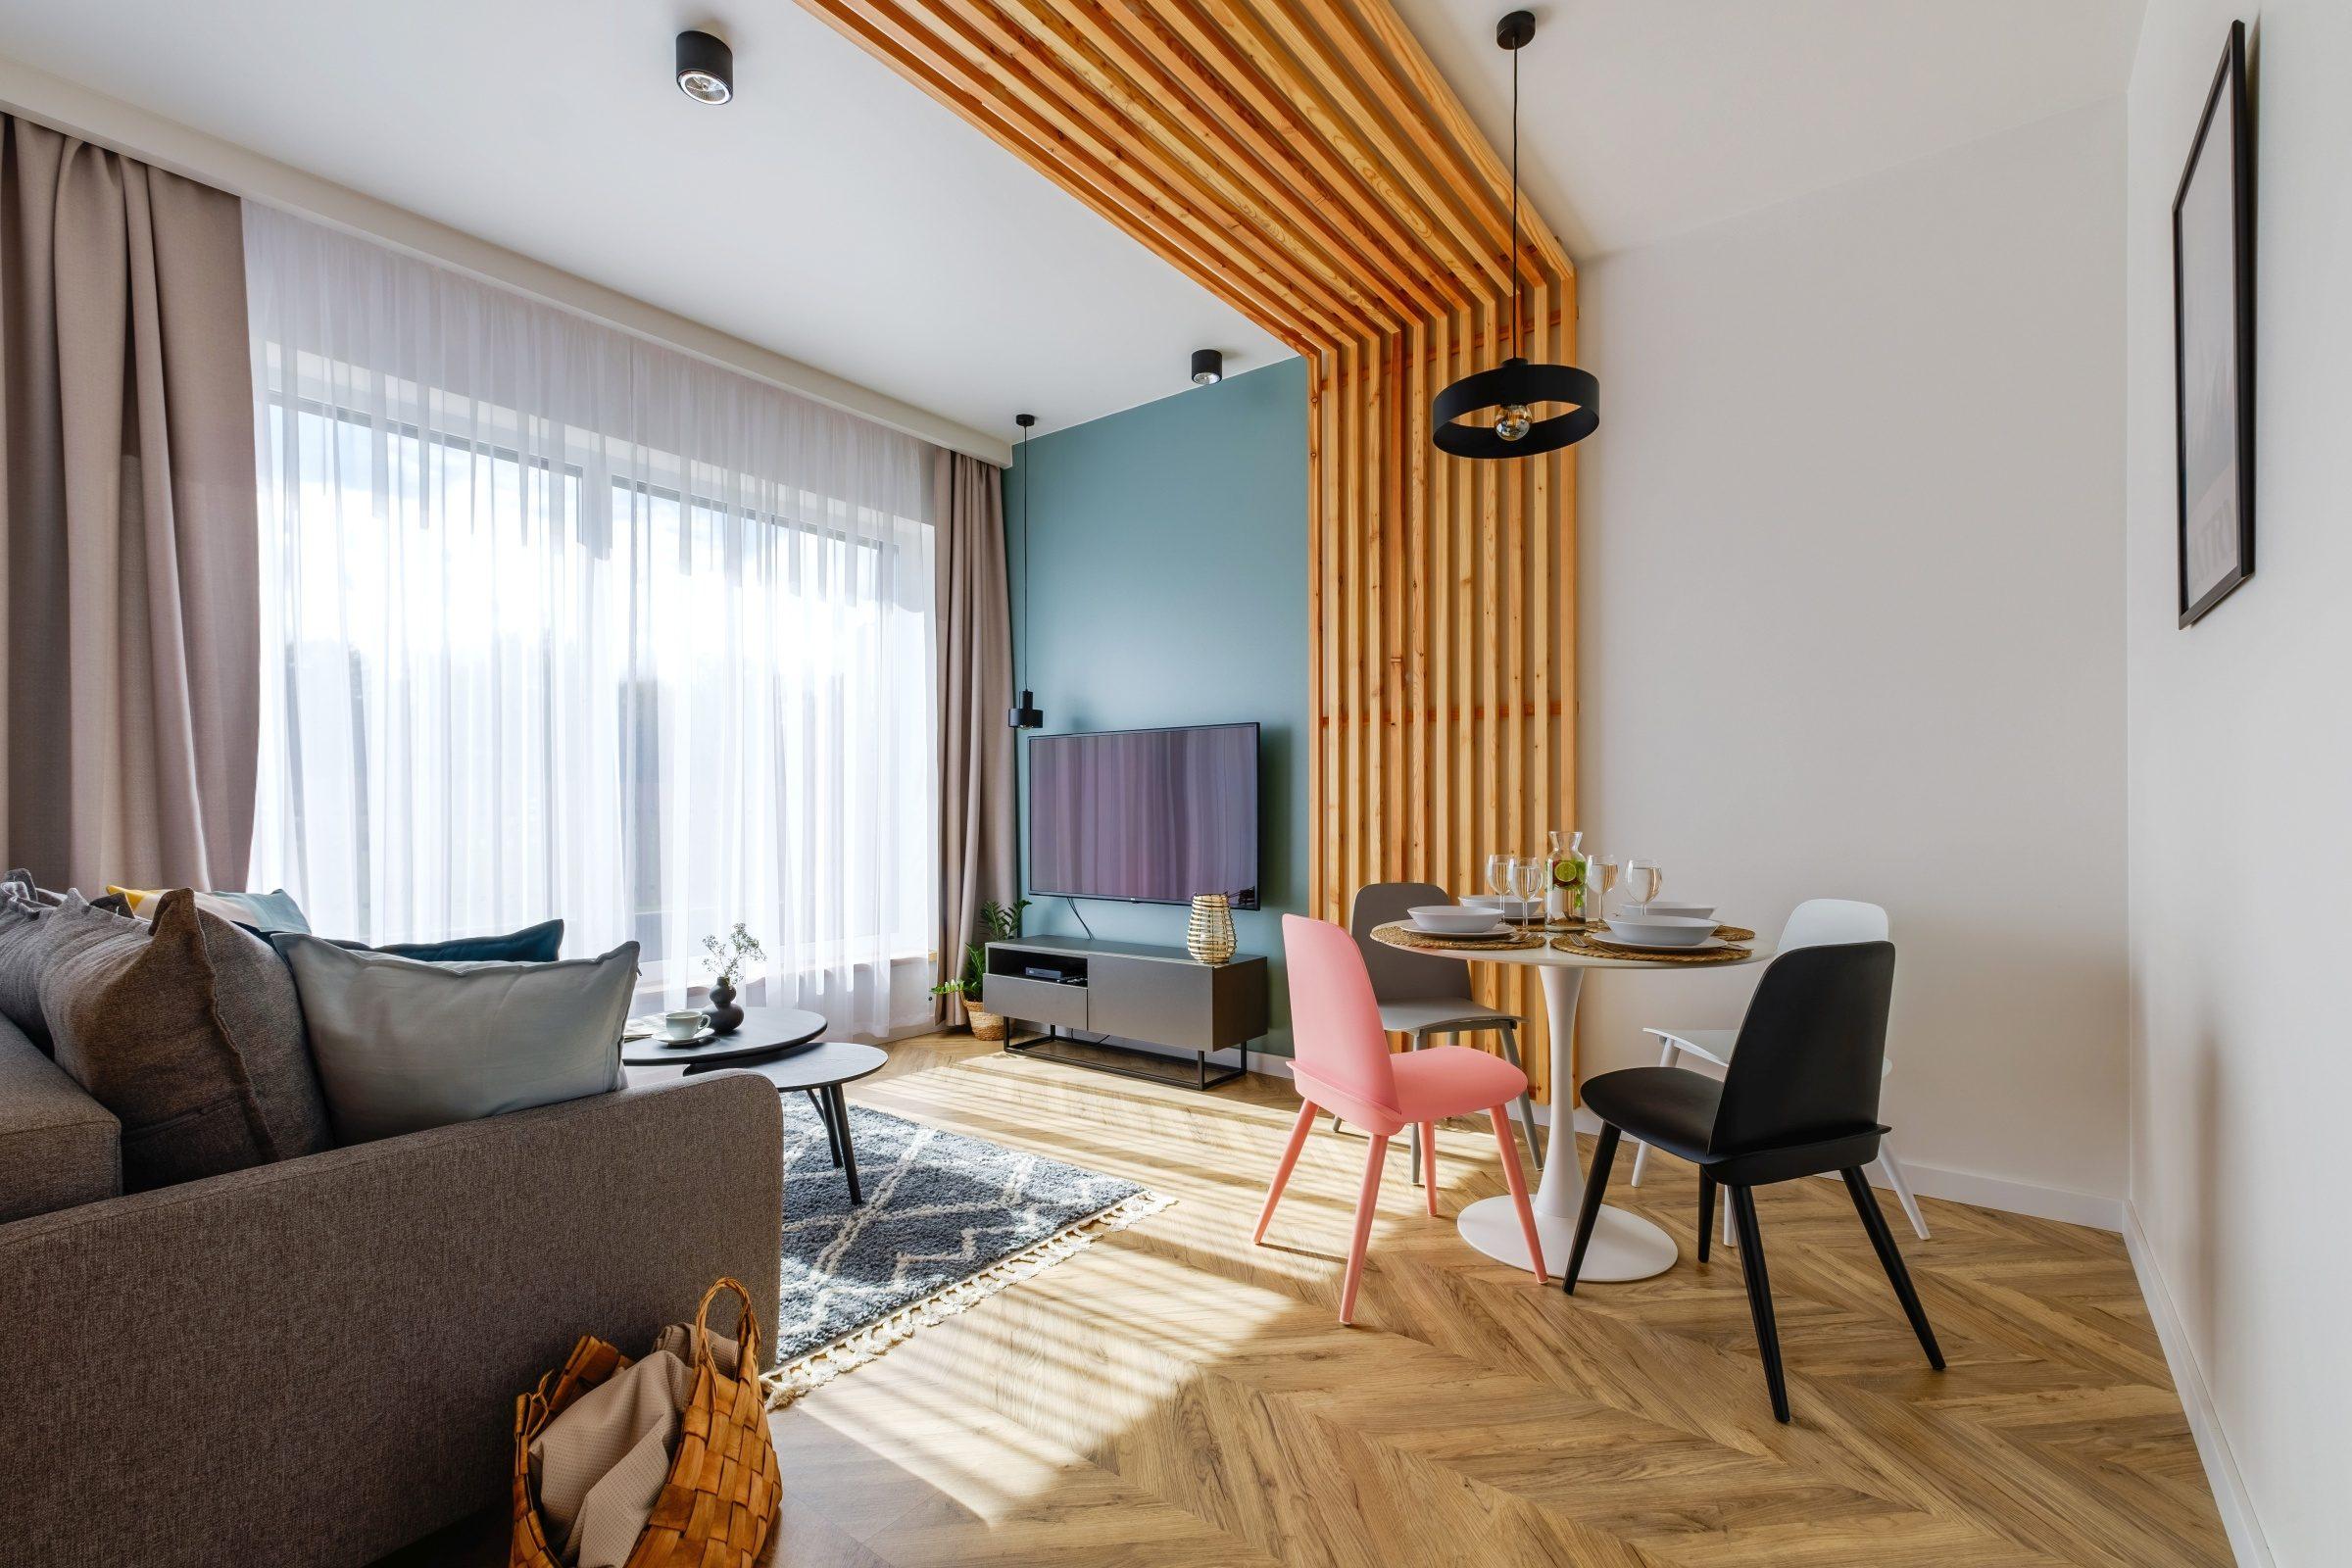 Apartamenty NOVA BIAŁKA Białka Tatrzańska apartament 7 salon